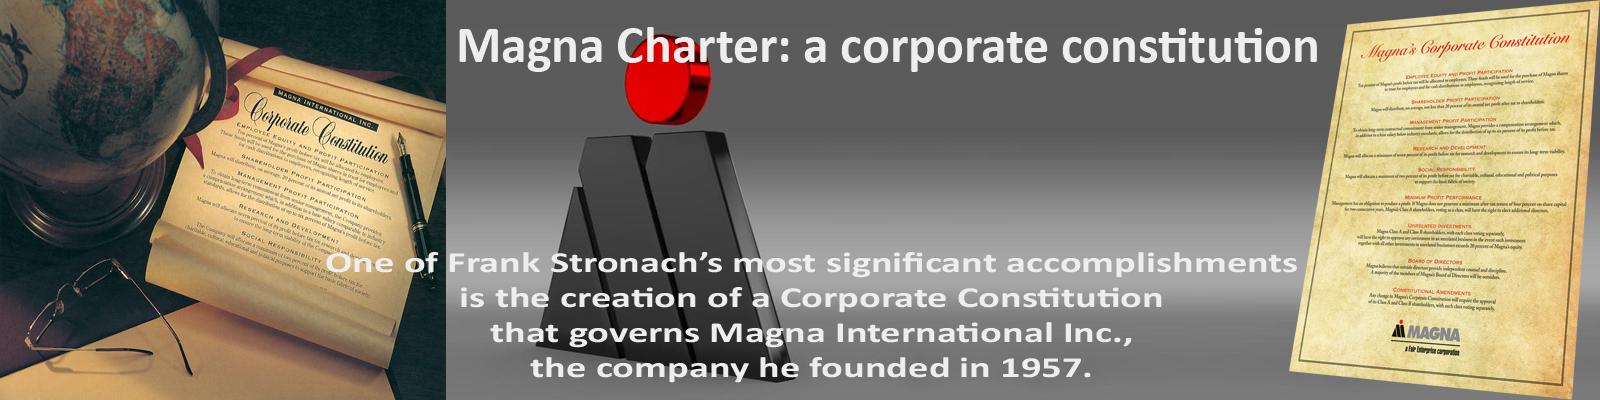 Magna Charter